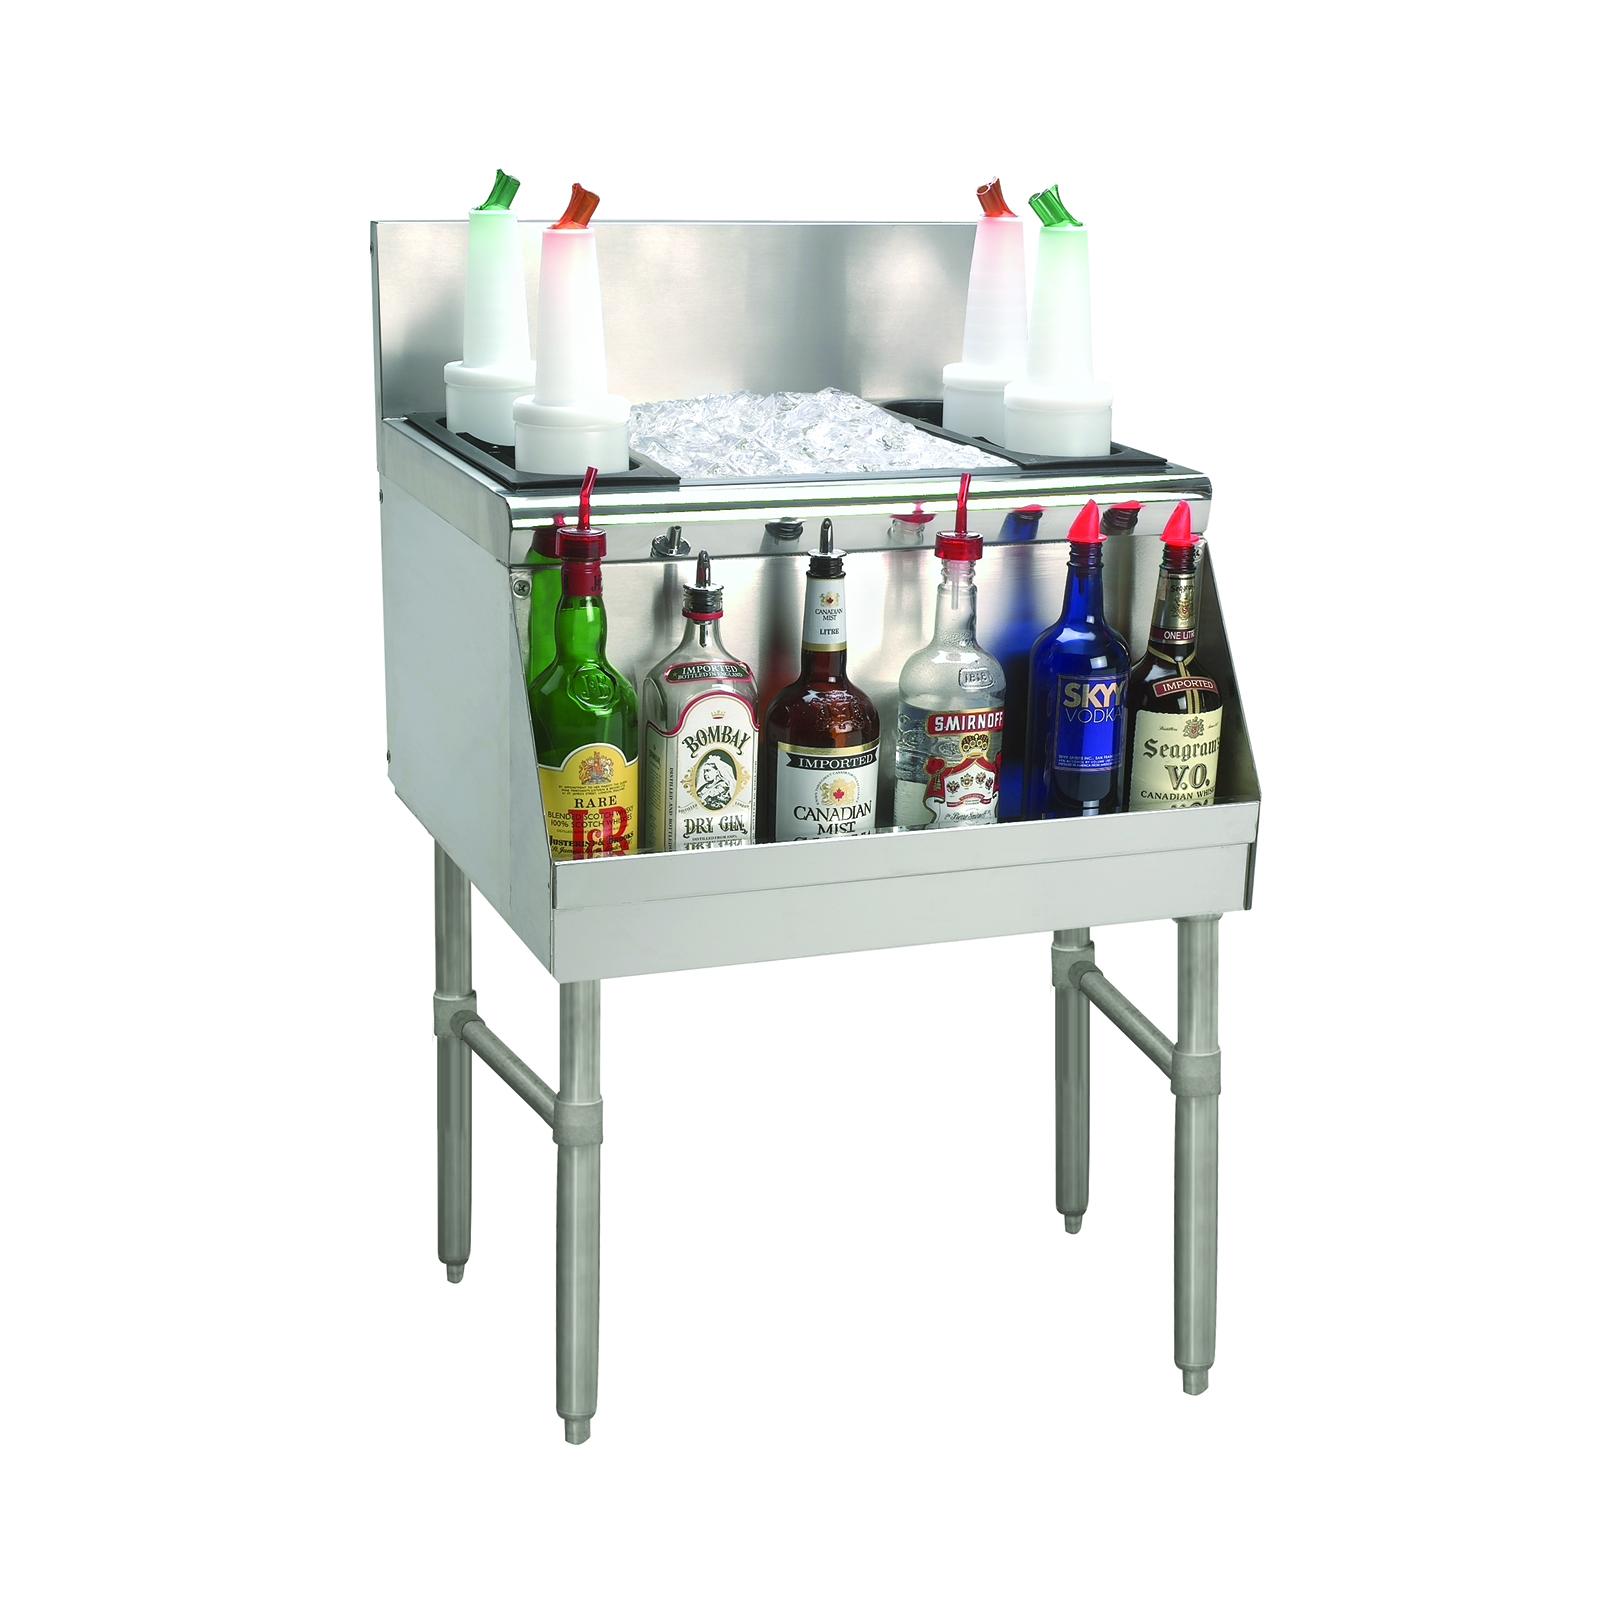 Advance Tabco PRI-24-30-10D underbar ice bin/cocktail unit